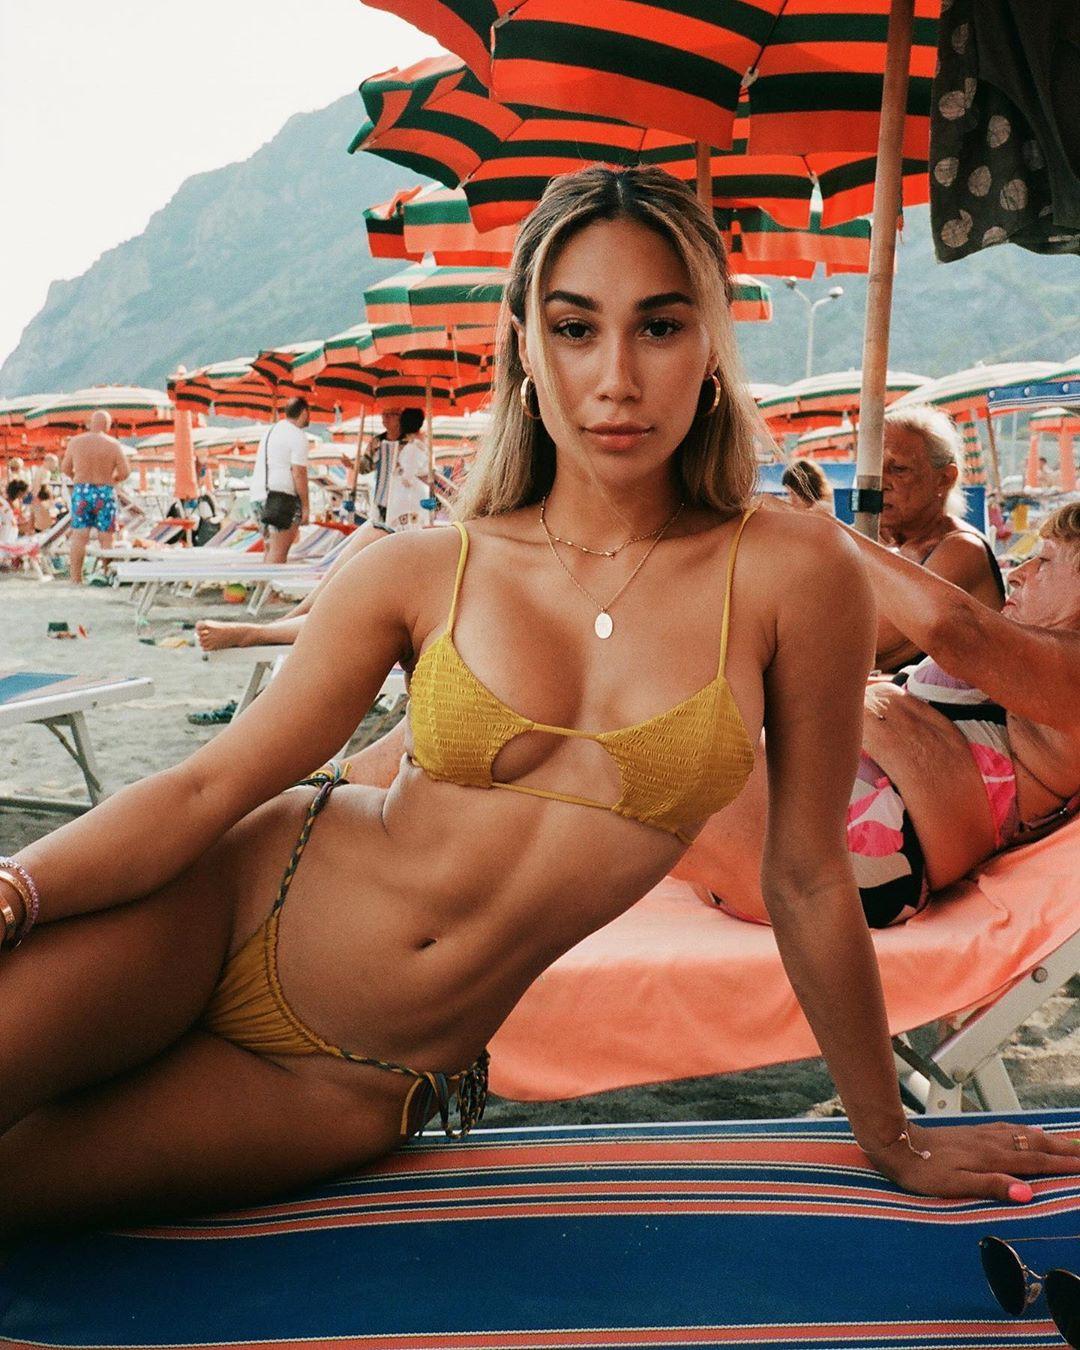 Eva Gutowski hottest picture, lingerie photoshoot, bikini girl swimwear colour combination